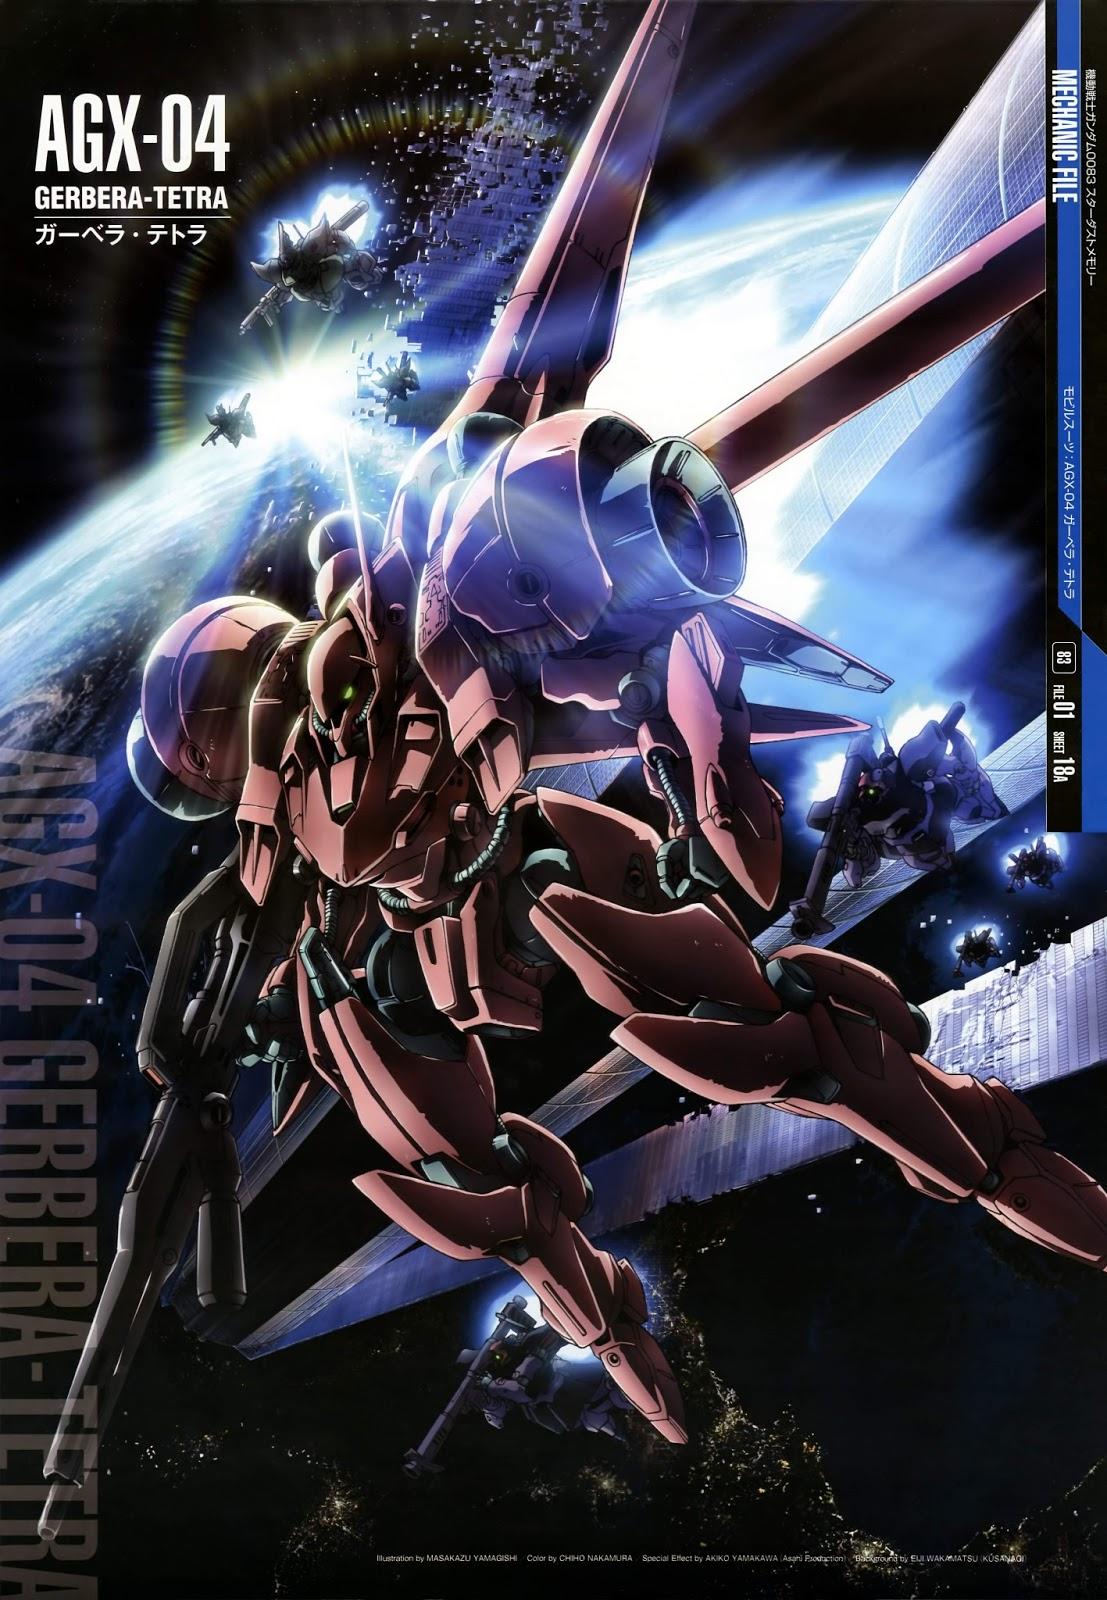 Mobile Suit Gundam - Wallpapers ~ Plamo Hub